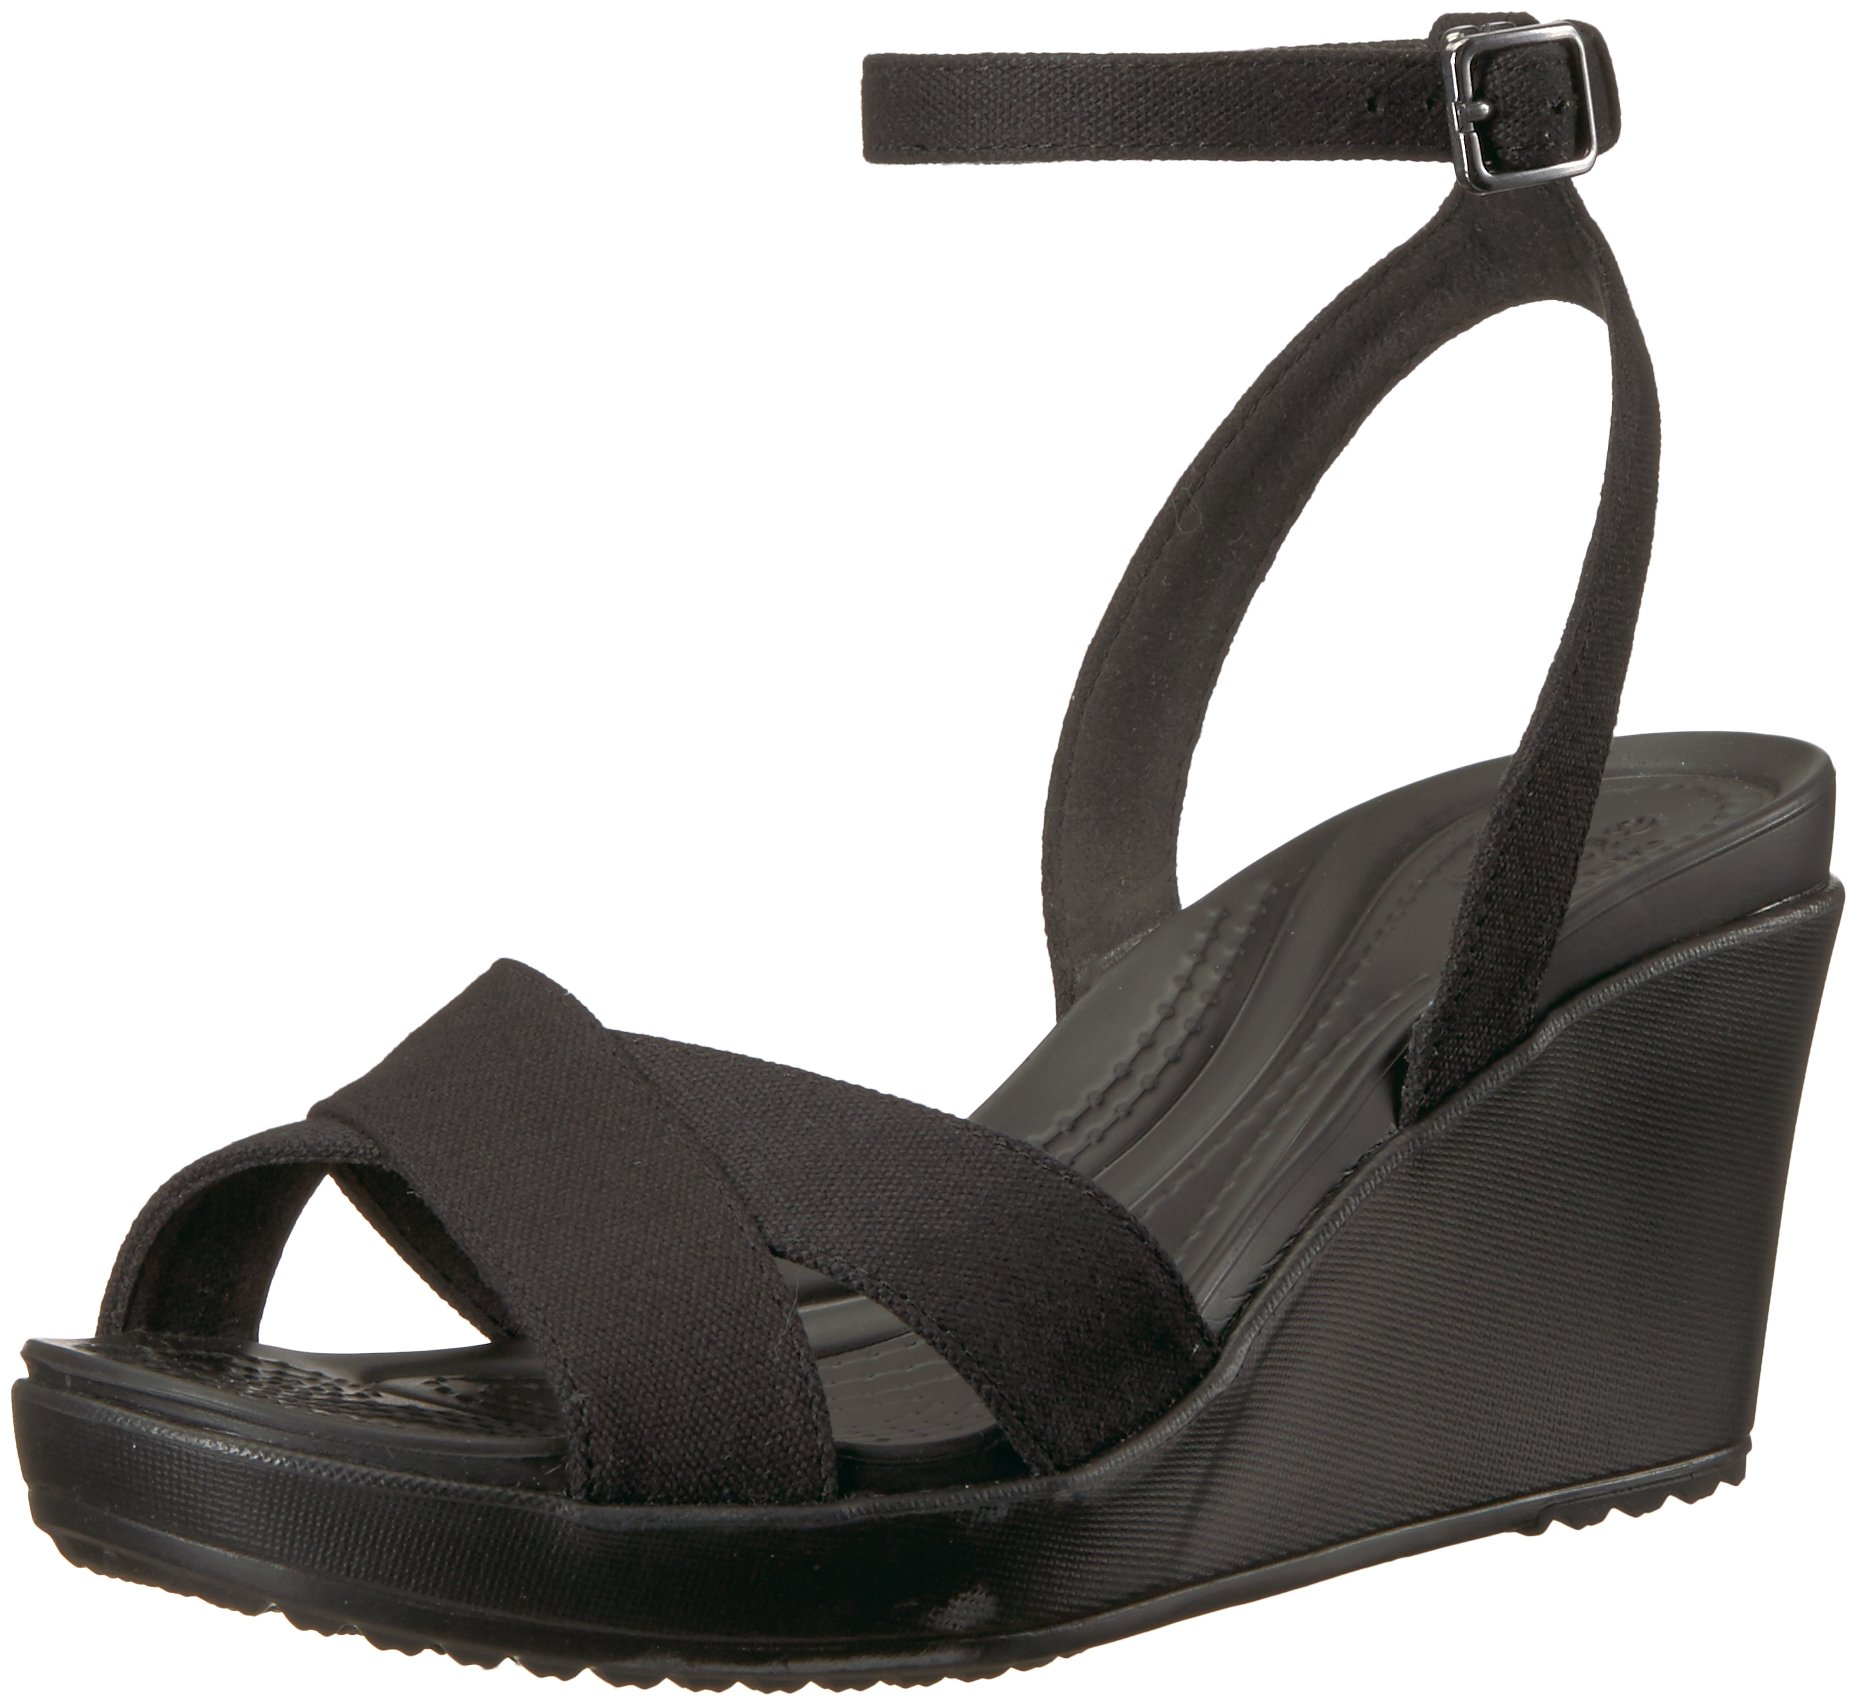 Crocs Women's Leigh II Ankle Strap Wedge W Sandal Black, 5 M US